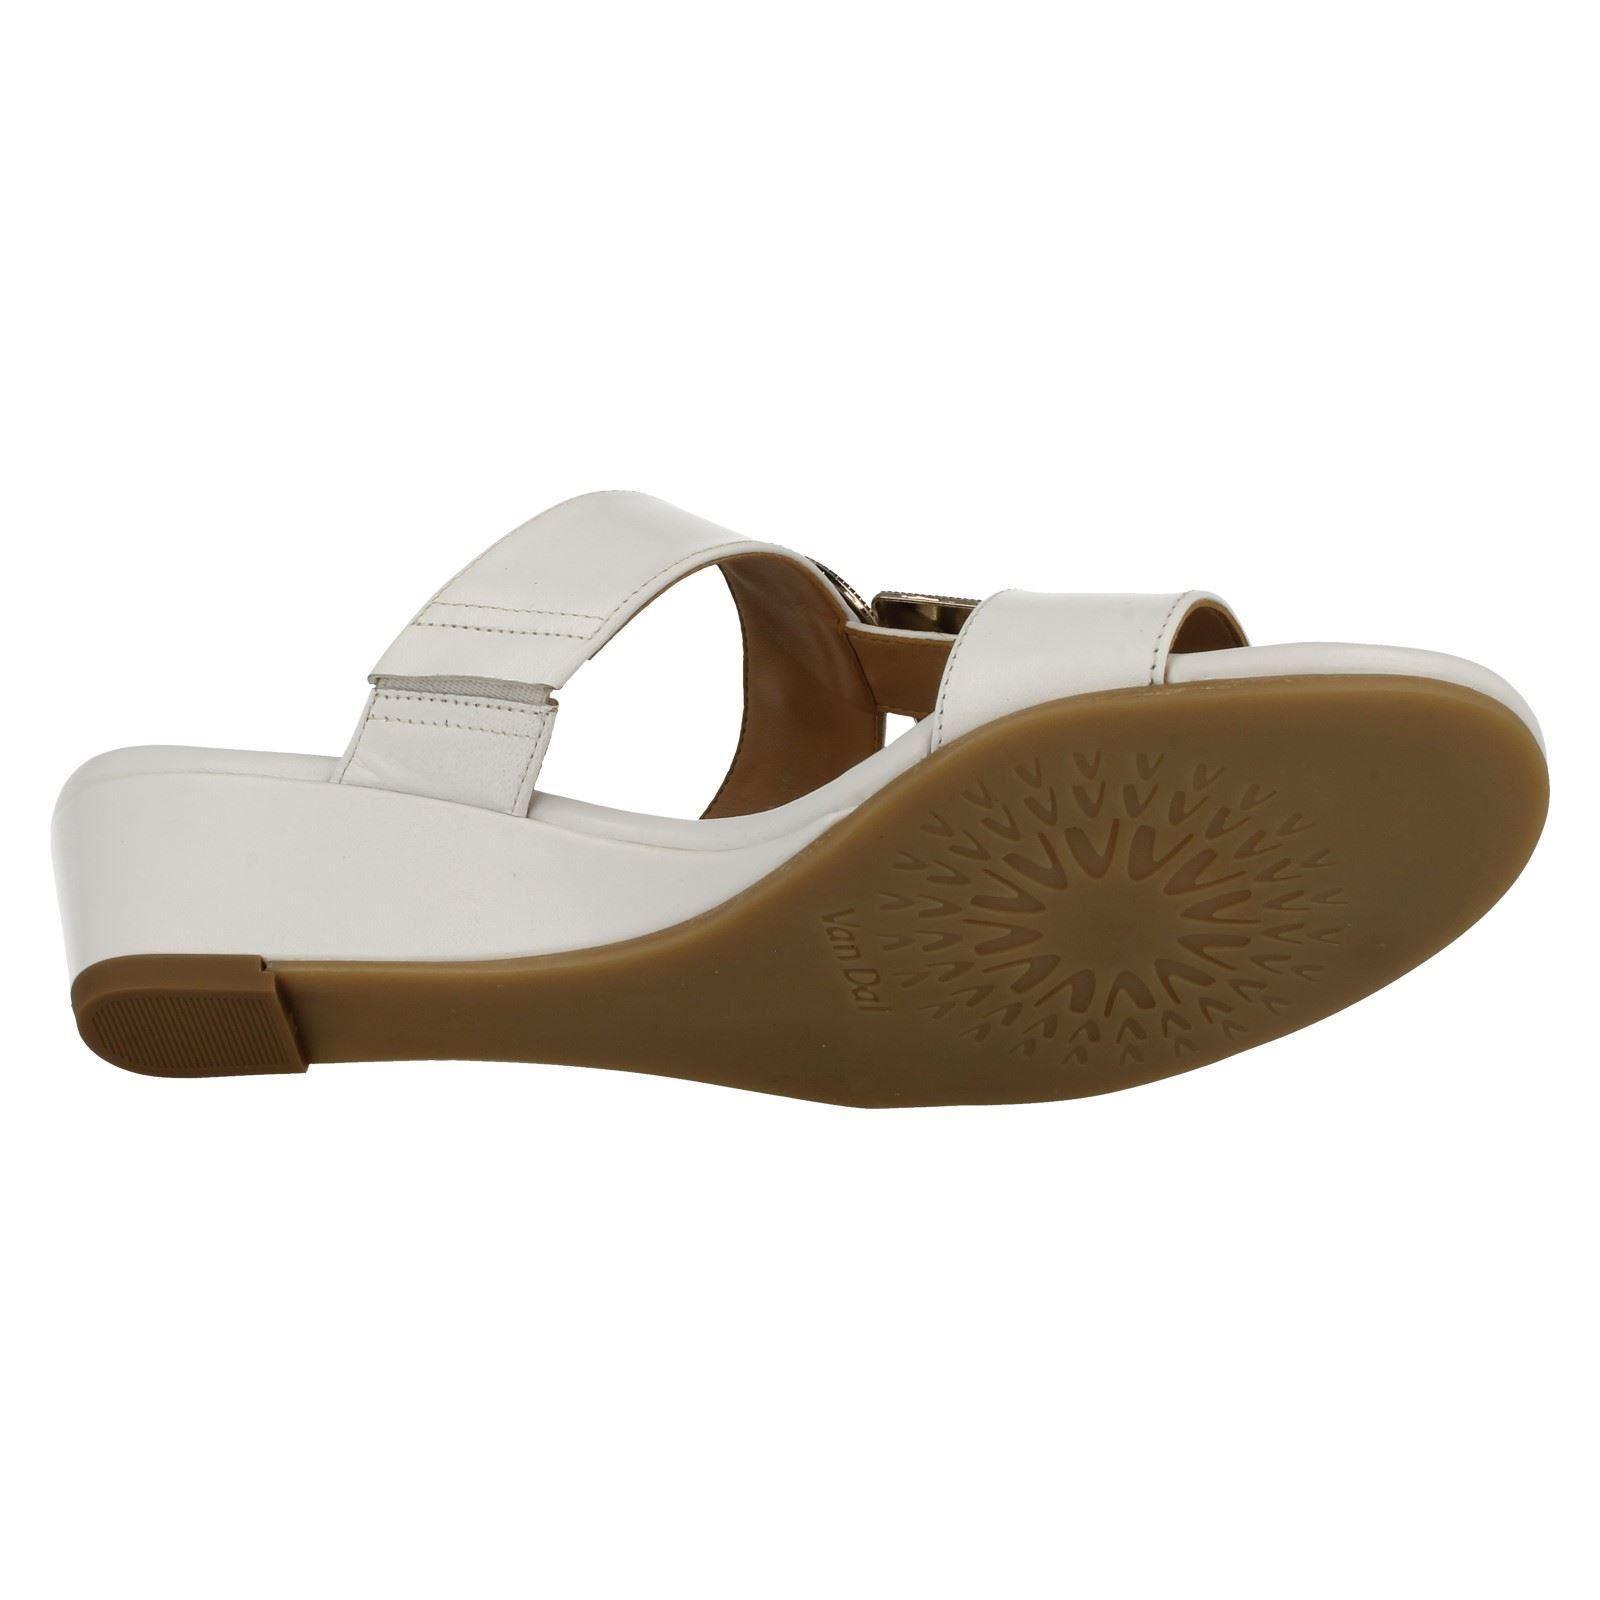 Ladies-Van-Dal-Open-Toe-Slip-On-Summer-Low-Wedge-Leather-Sandals-Epsom thumbnail 10